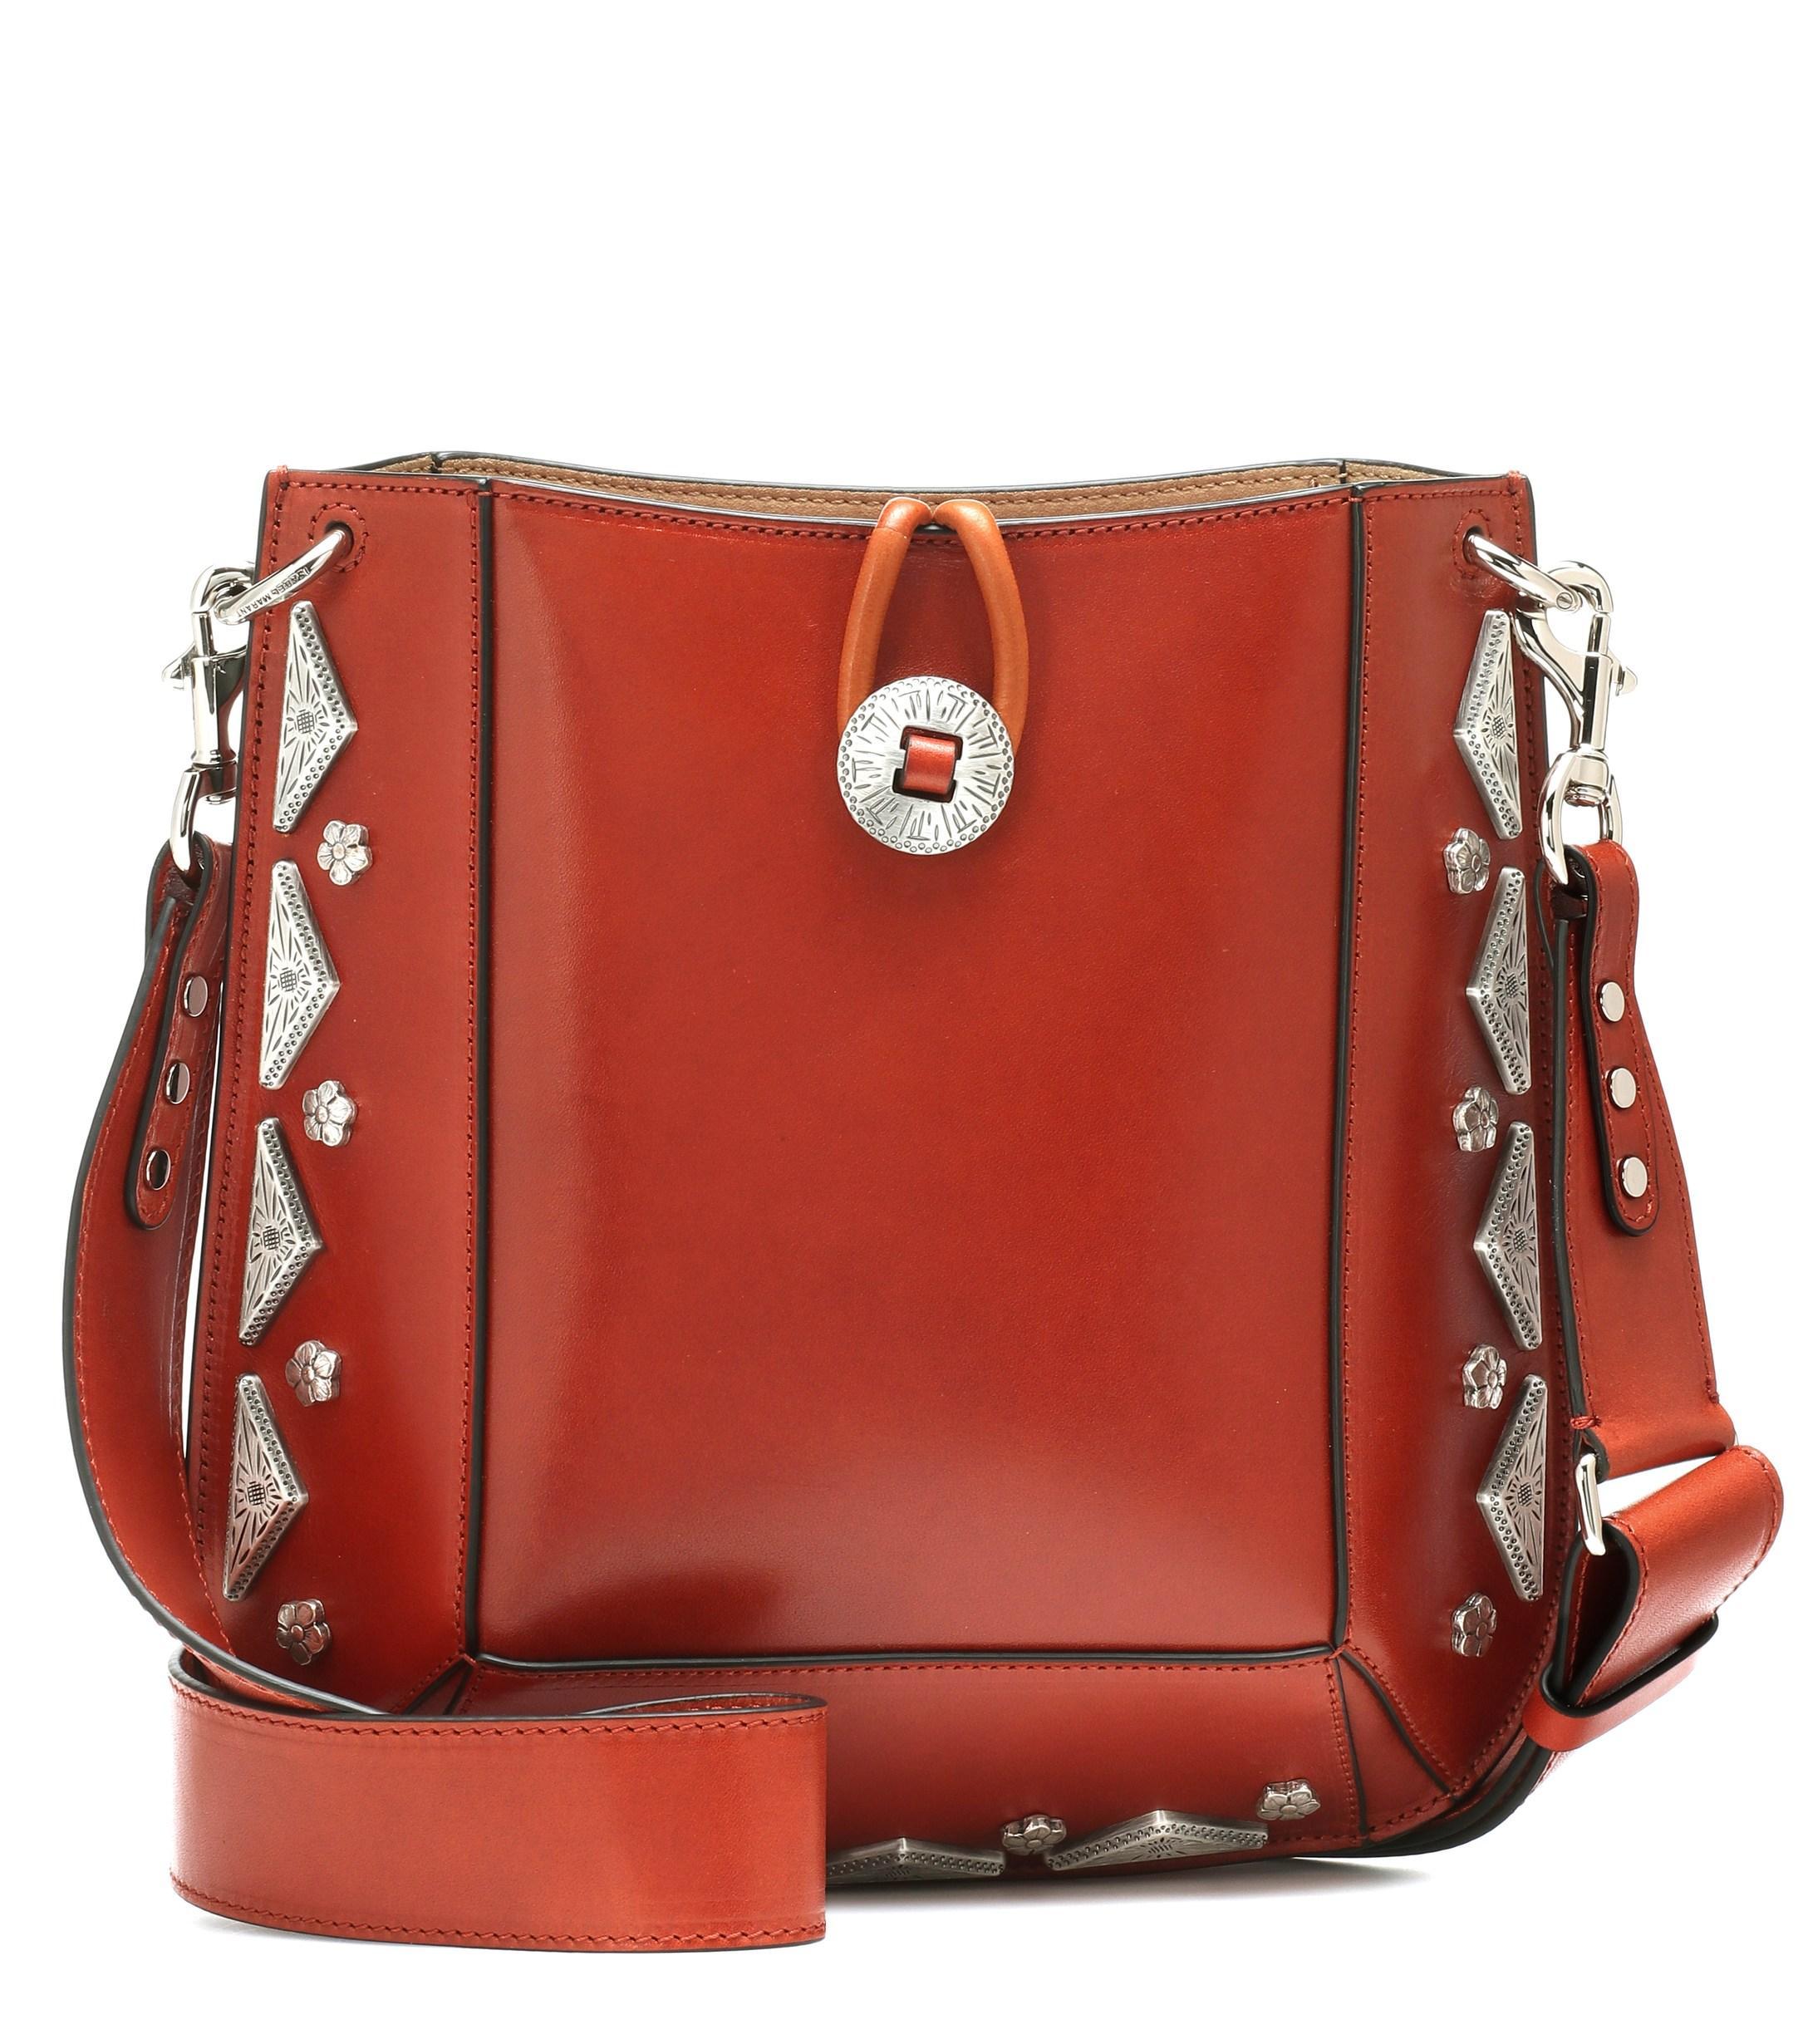 60bfc20ee0 Isabel Marant - Multicolor Oskana Small Leather Shoulder Bag - Lyst. View  fullscreen